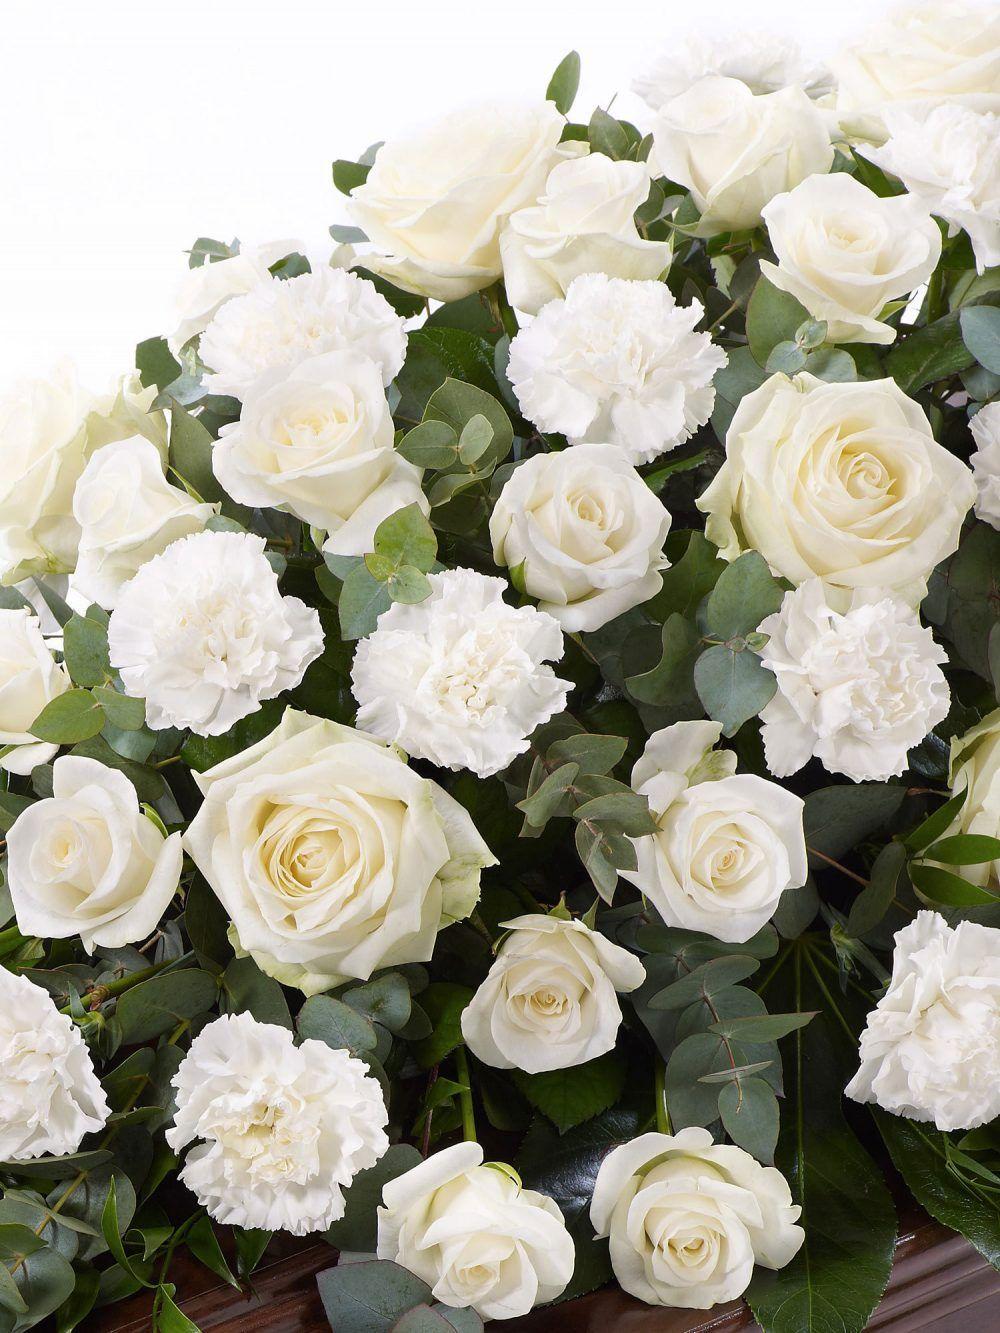 Rose And Carnation Casket Spray White 1